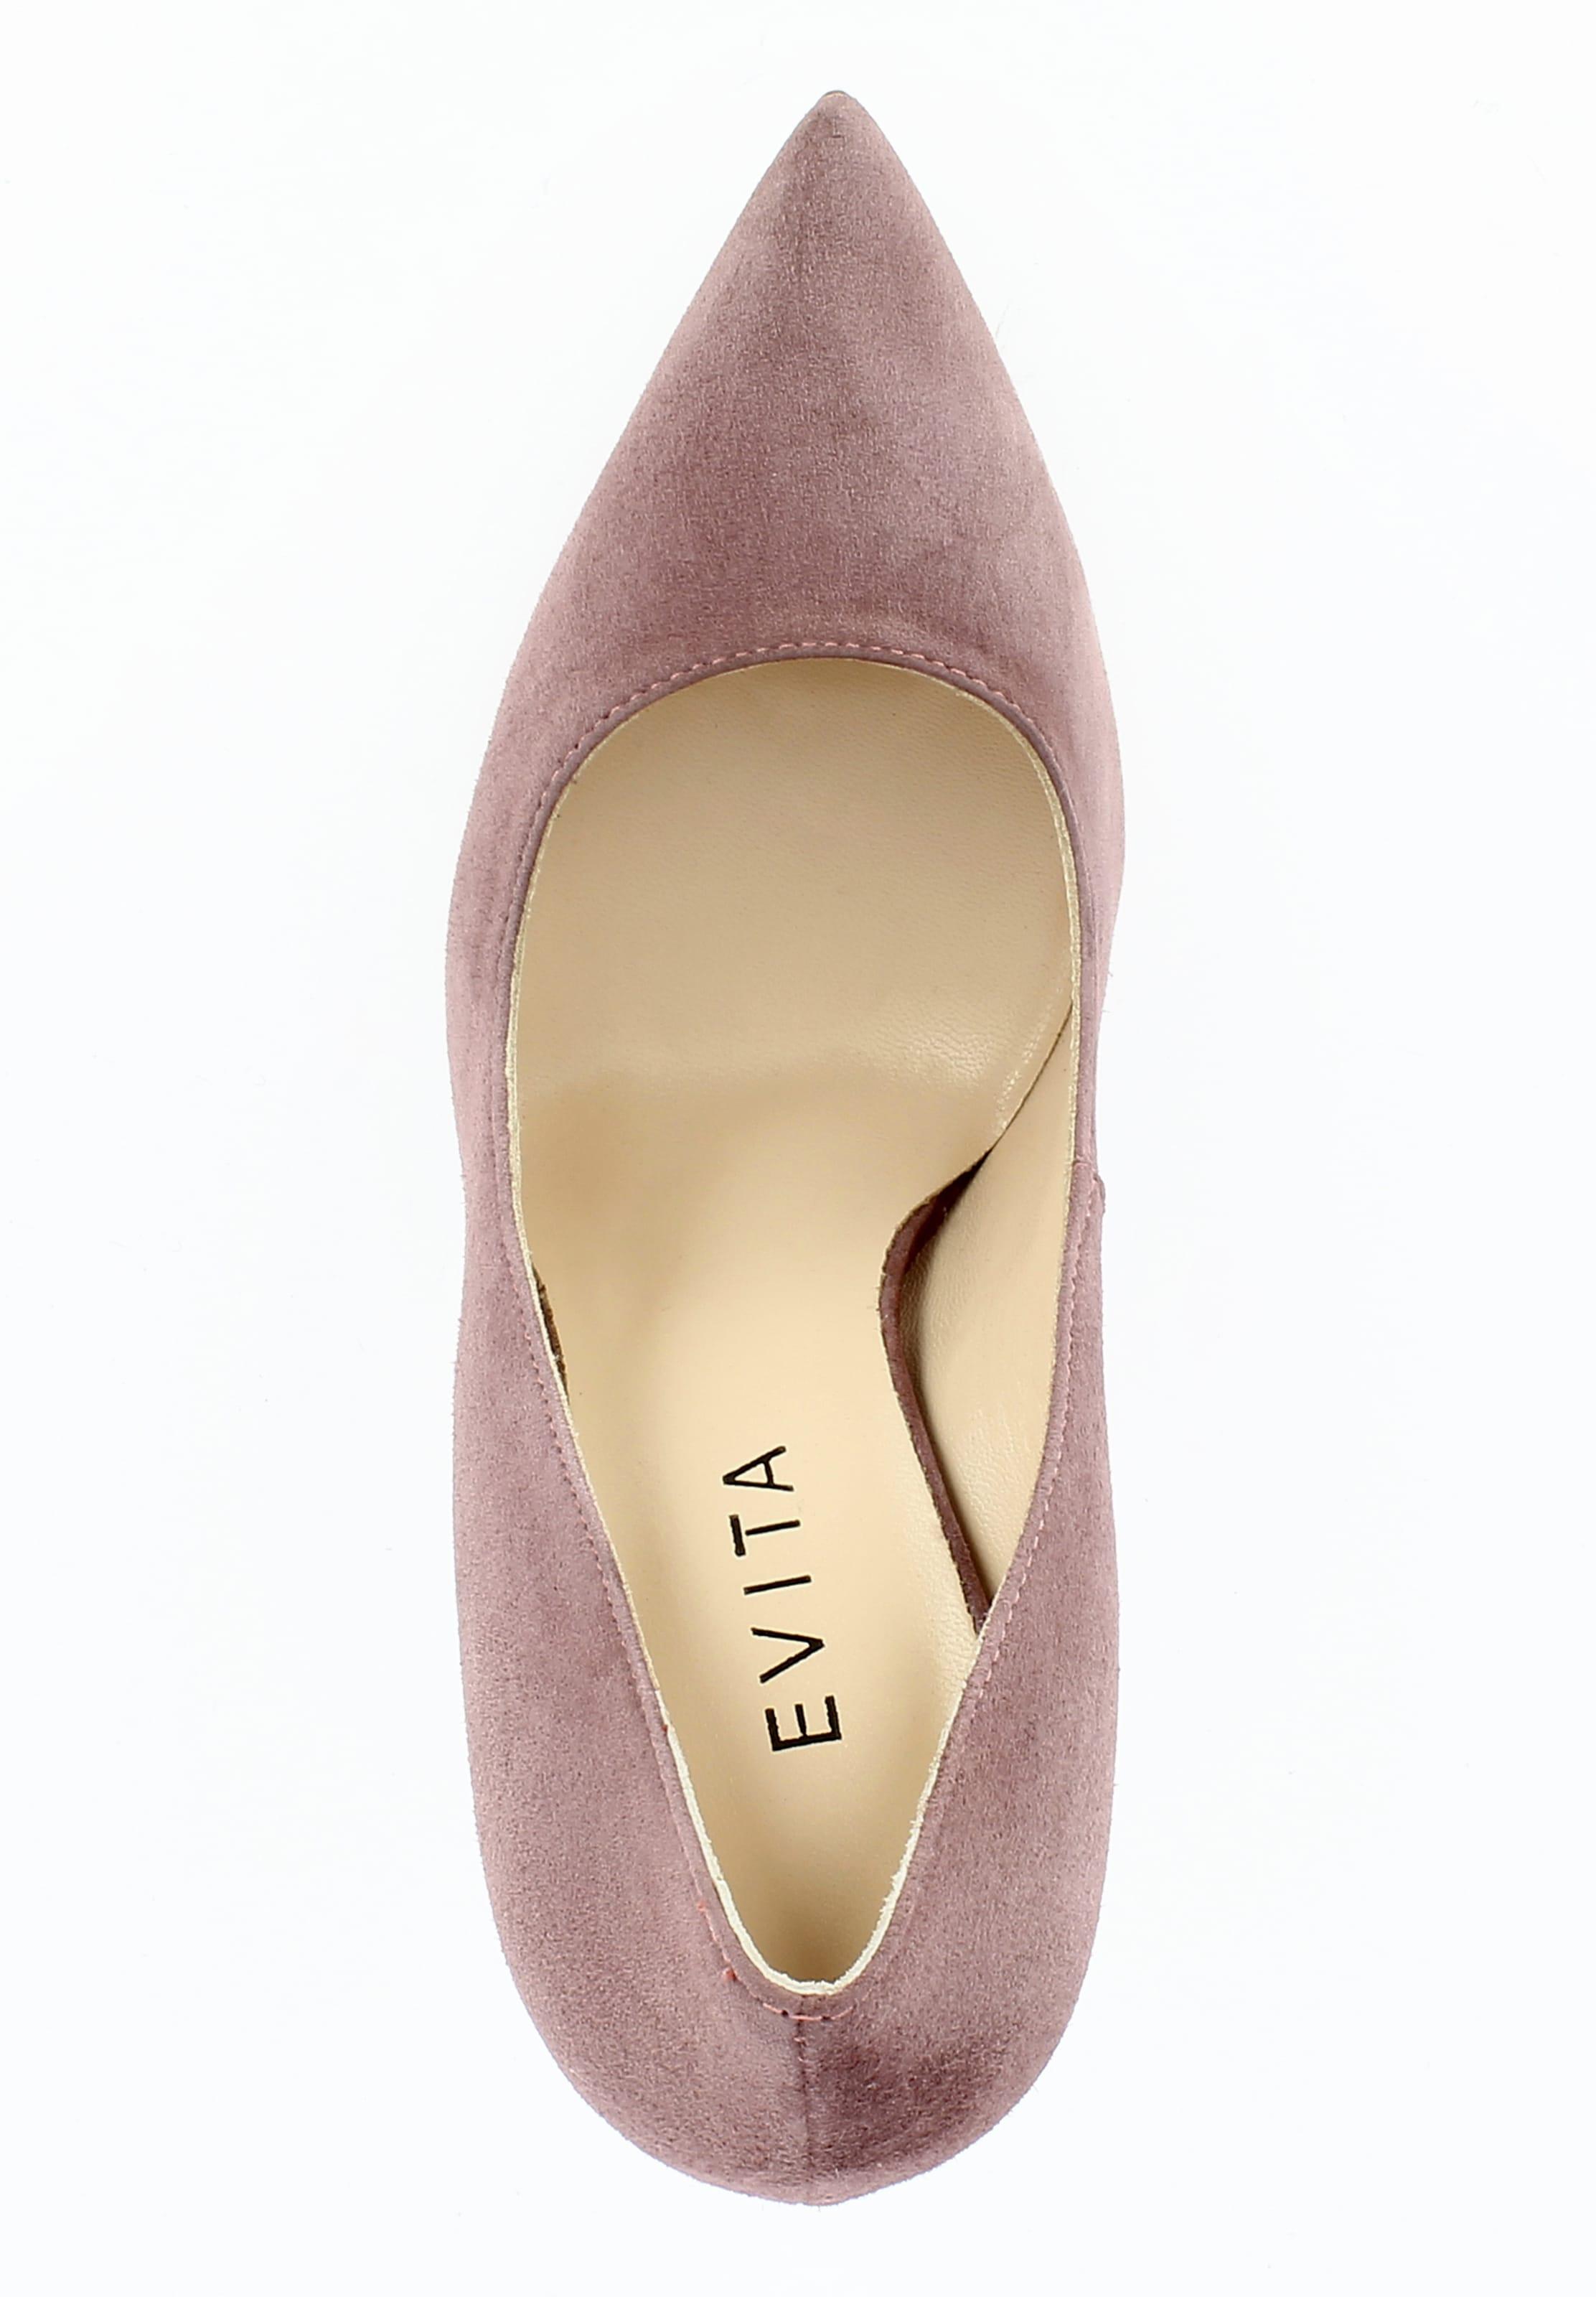 Rouge Evita Escarpins Escarpins Evita En 1clKTJF